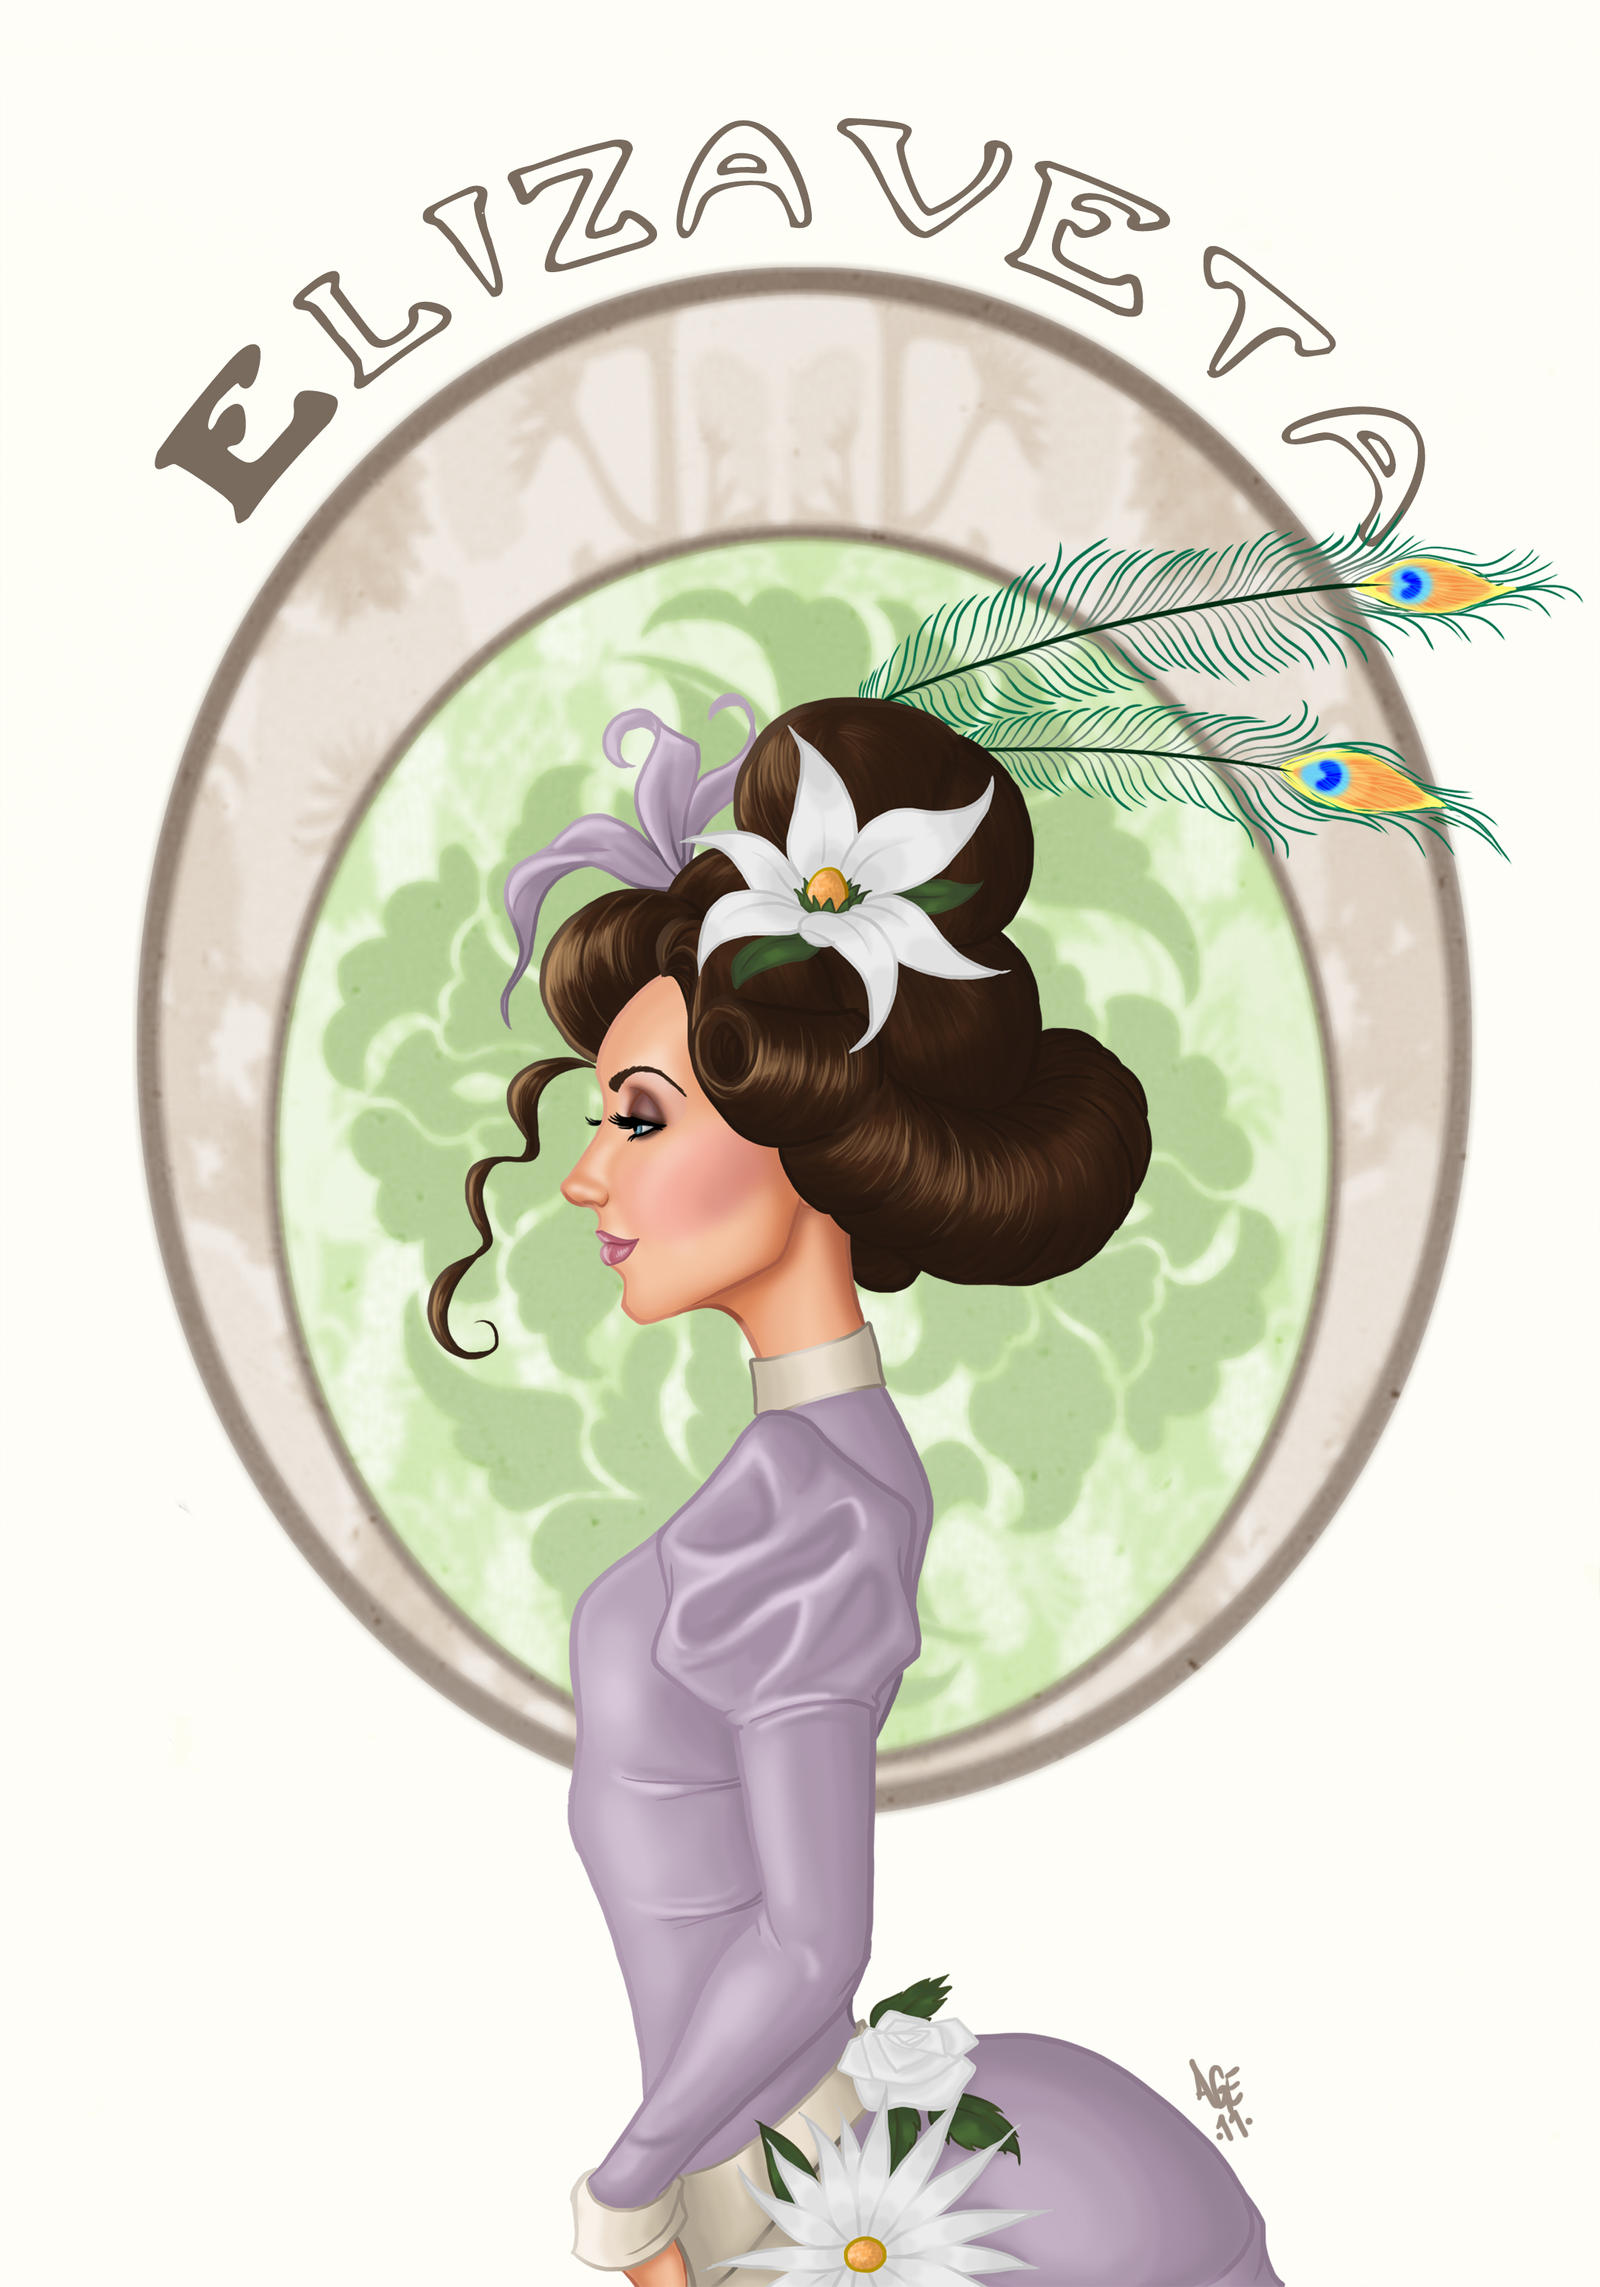 Elizaveta Close up by Age-Velez